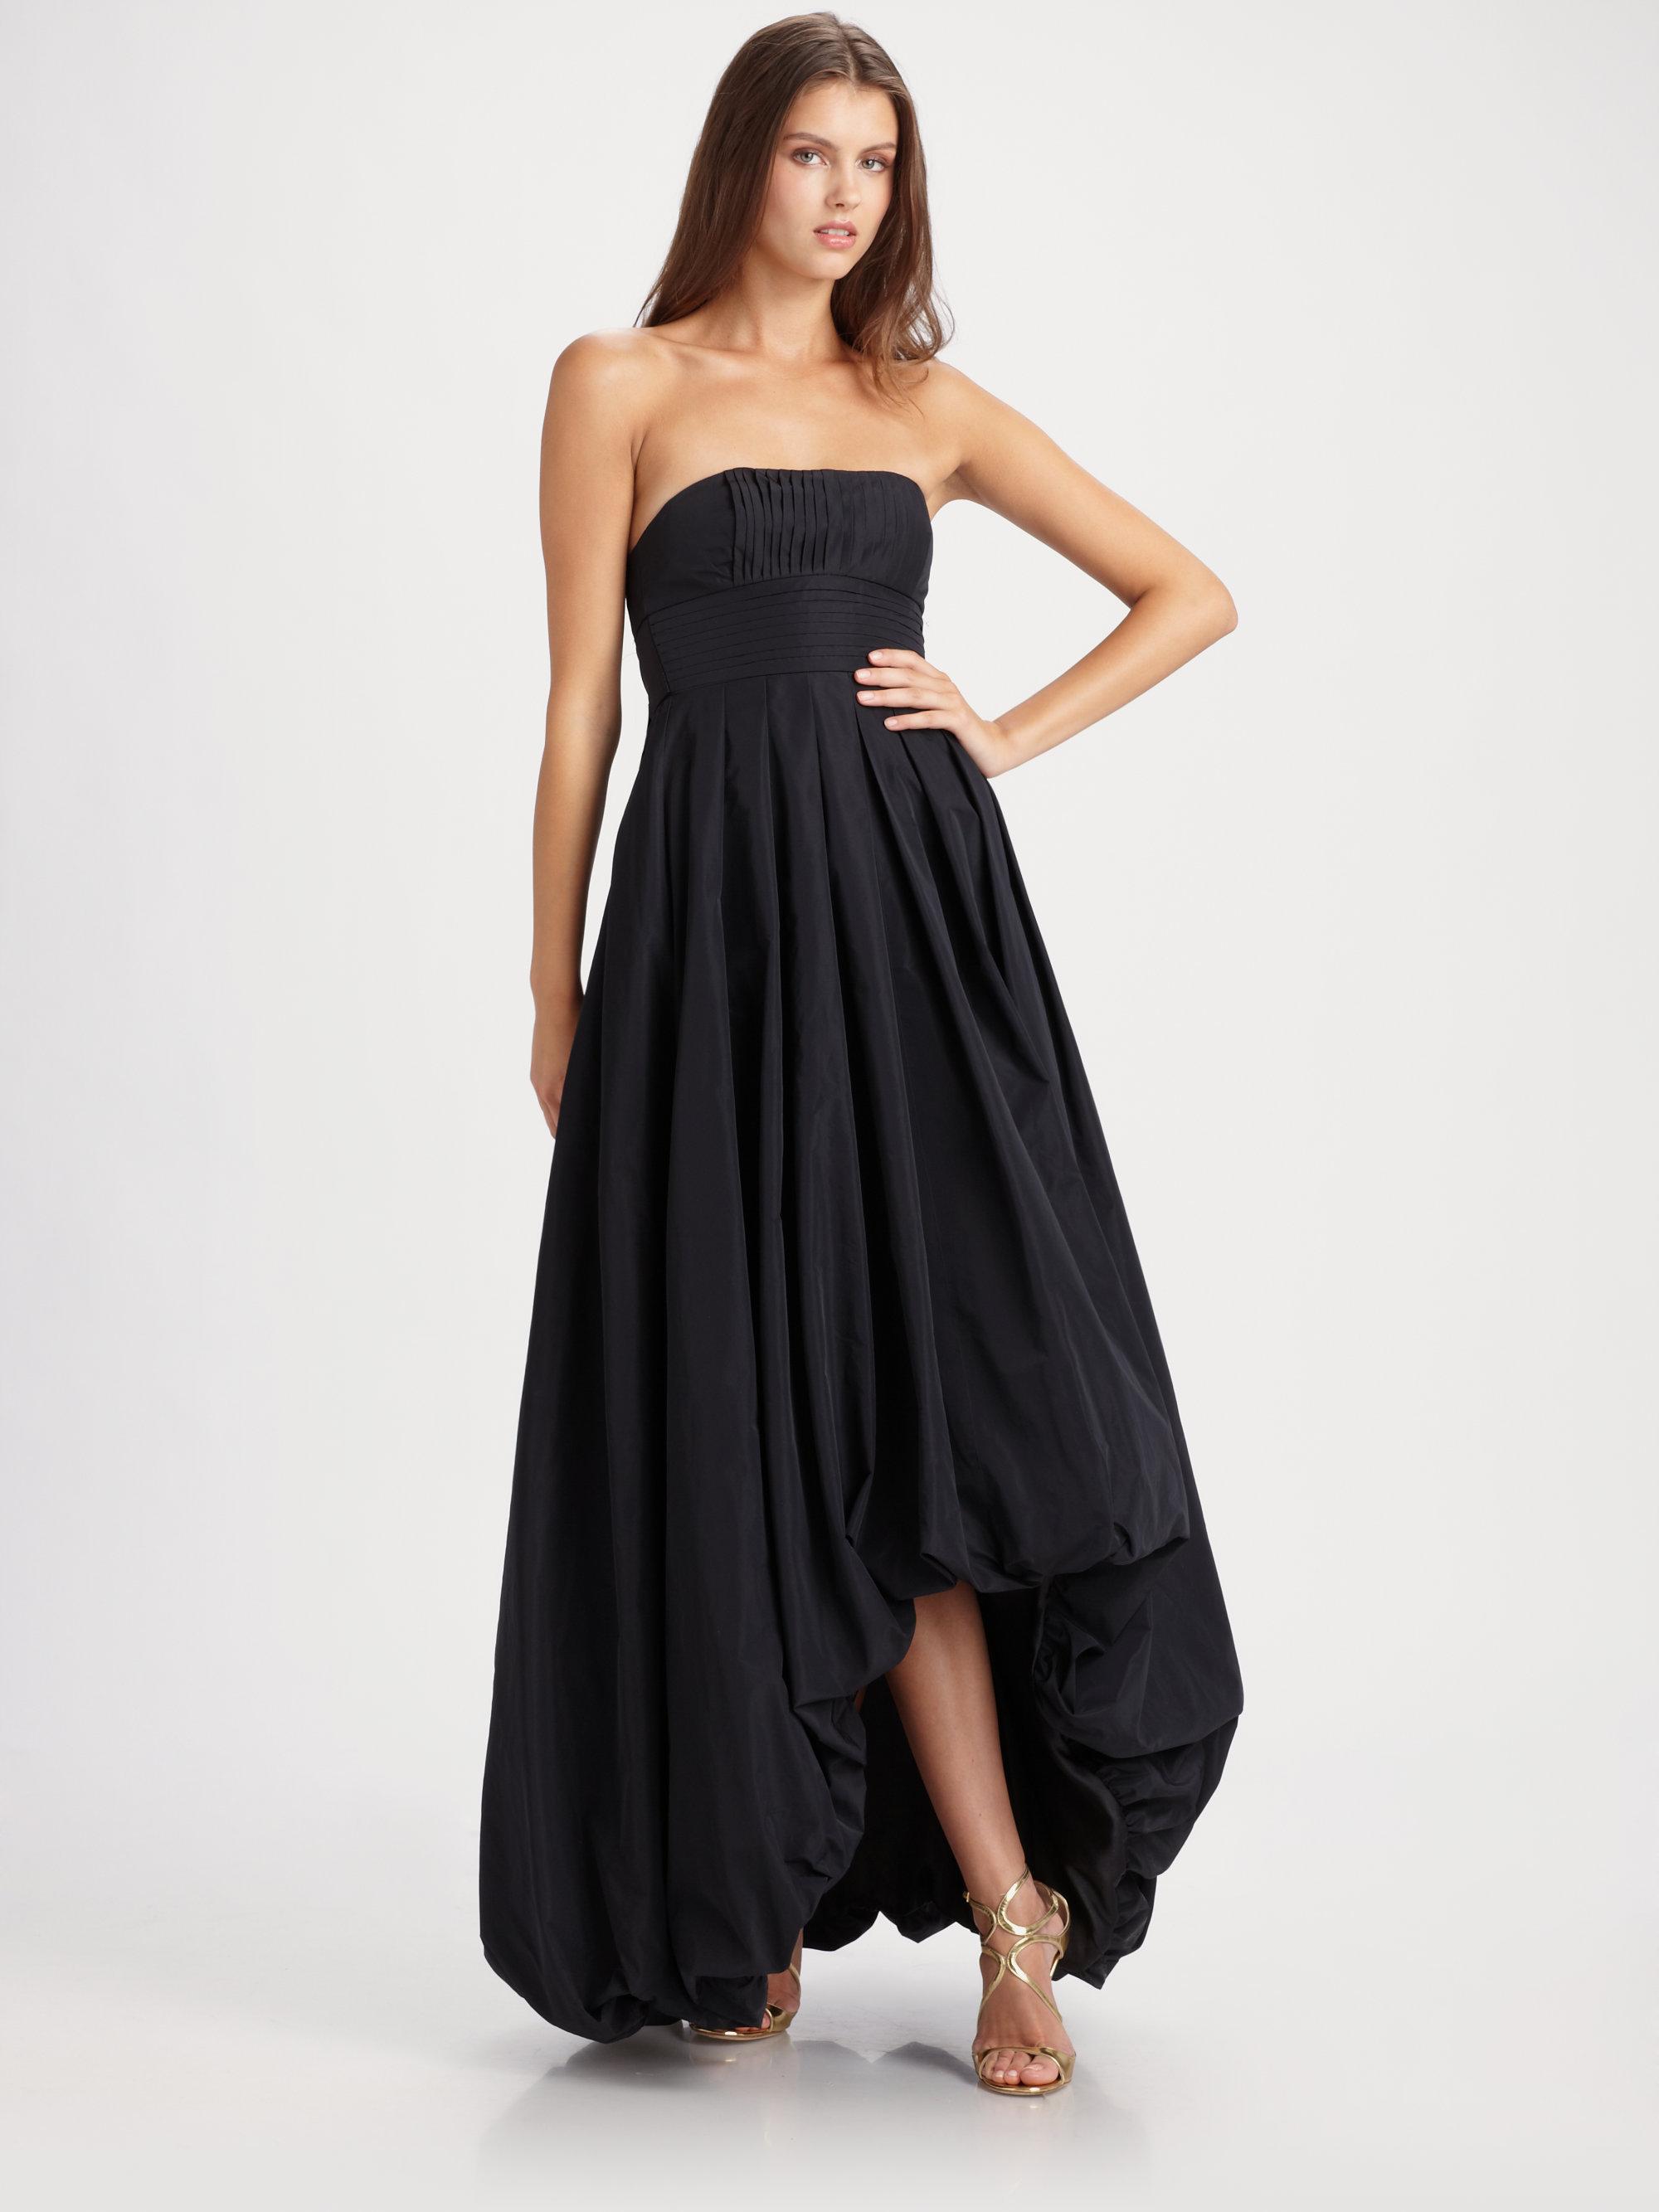 Lyst - Bcbgmaxazria Strapless Hilow Hem Dress in Black